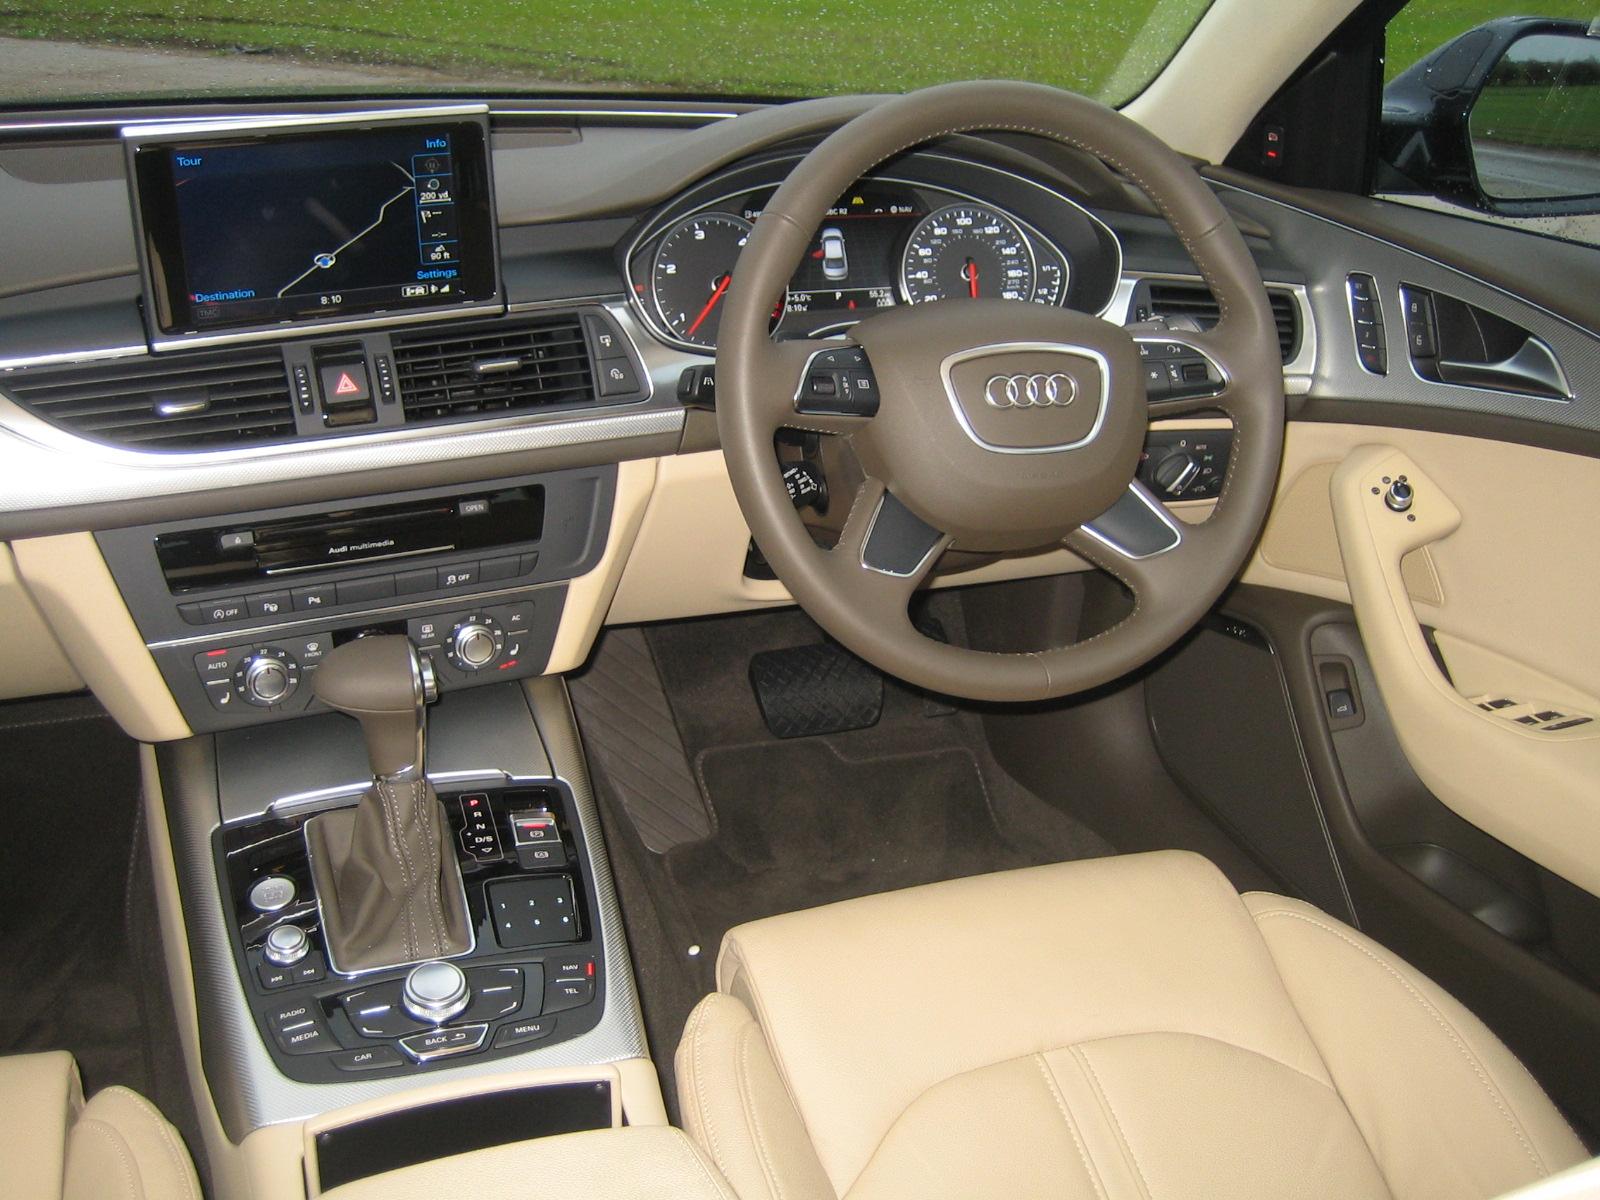 audi a6 3.0 bitdi quattro se 313ps review - wheel world reviews